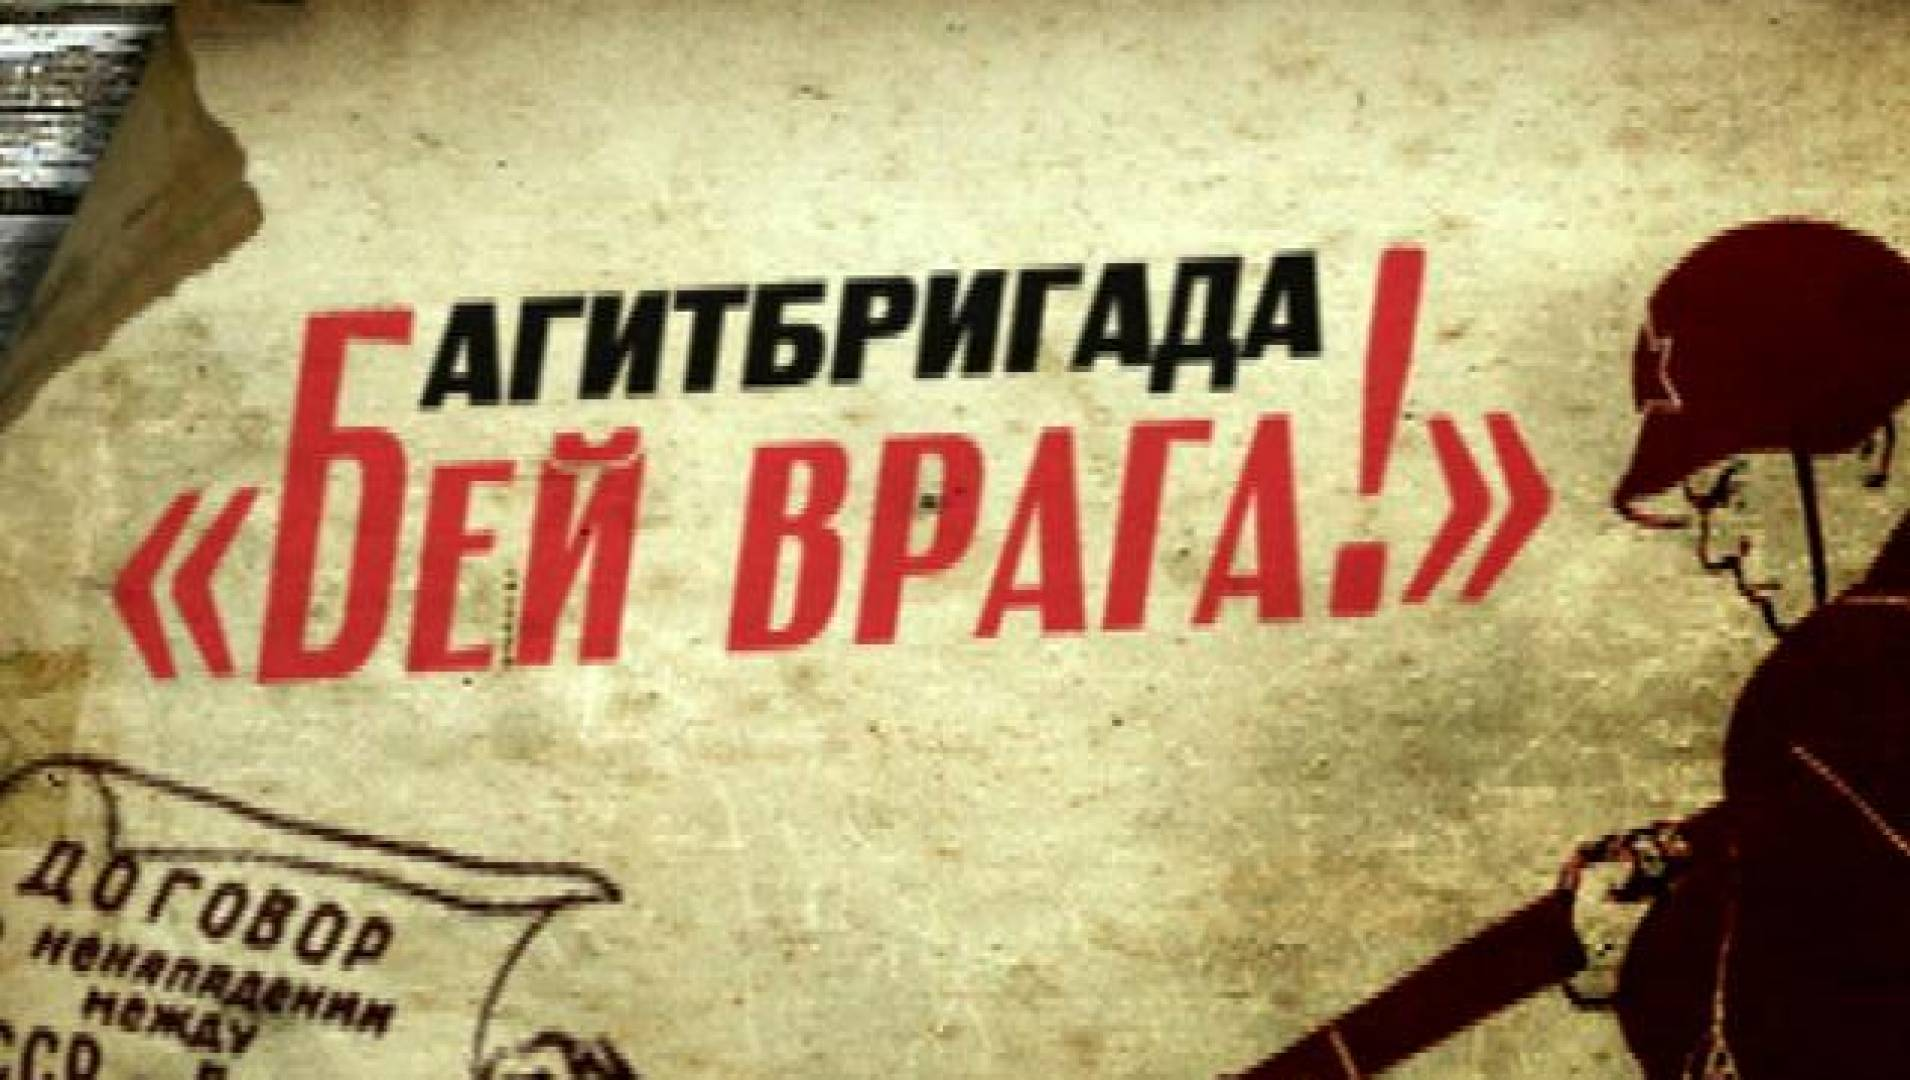 Агитбригада «Бей врага!» - Мелодрама, Фильм